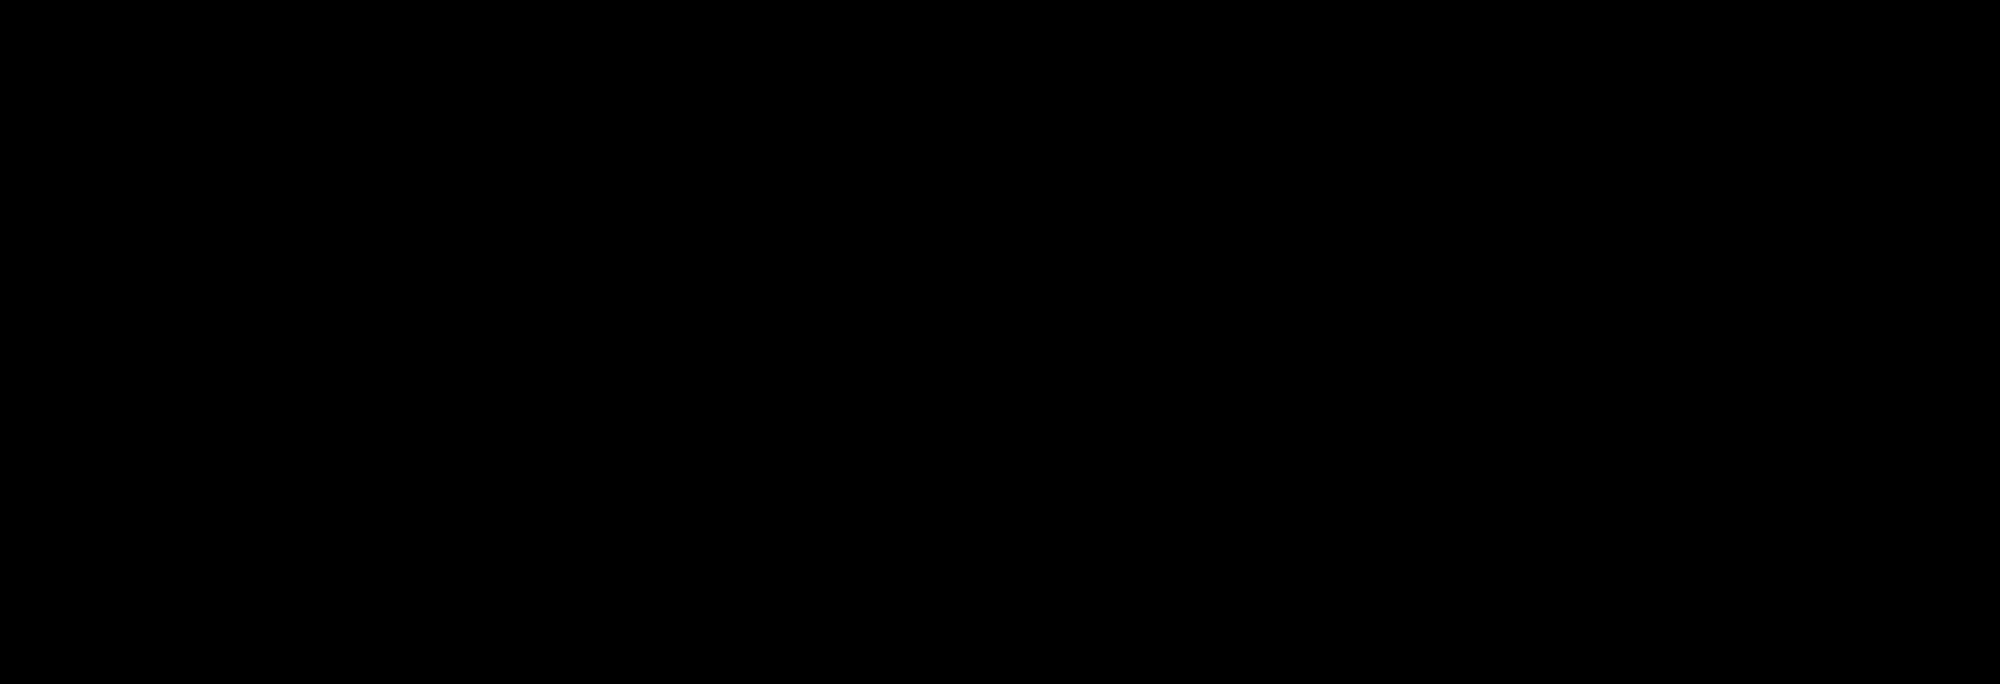 File sony believe logo. Make png files